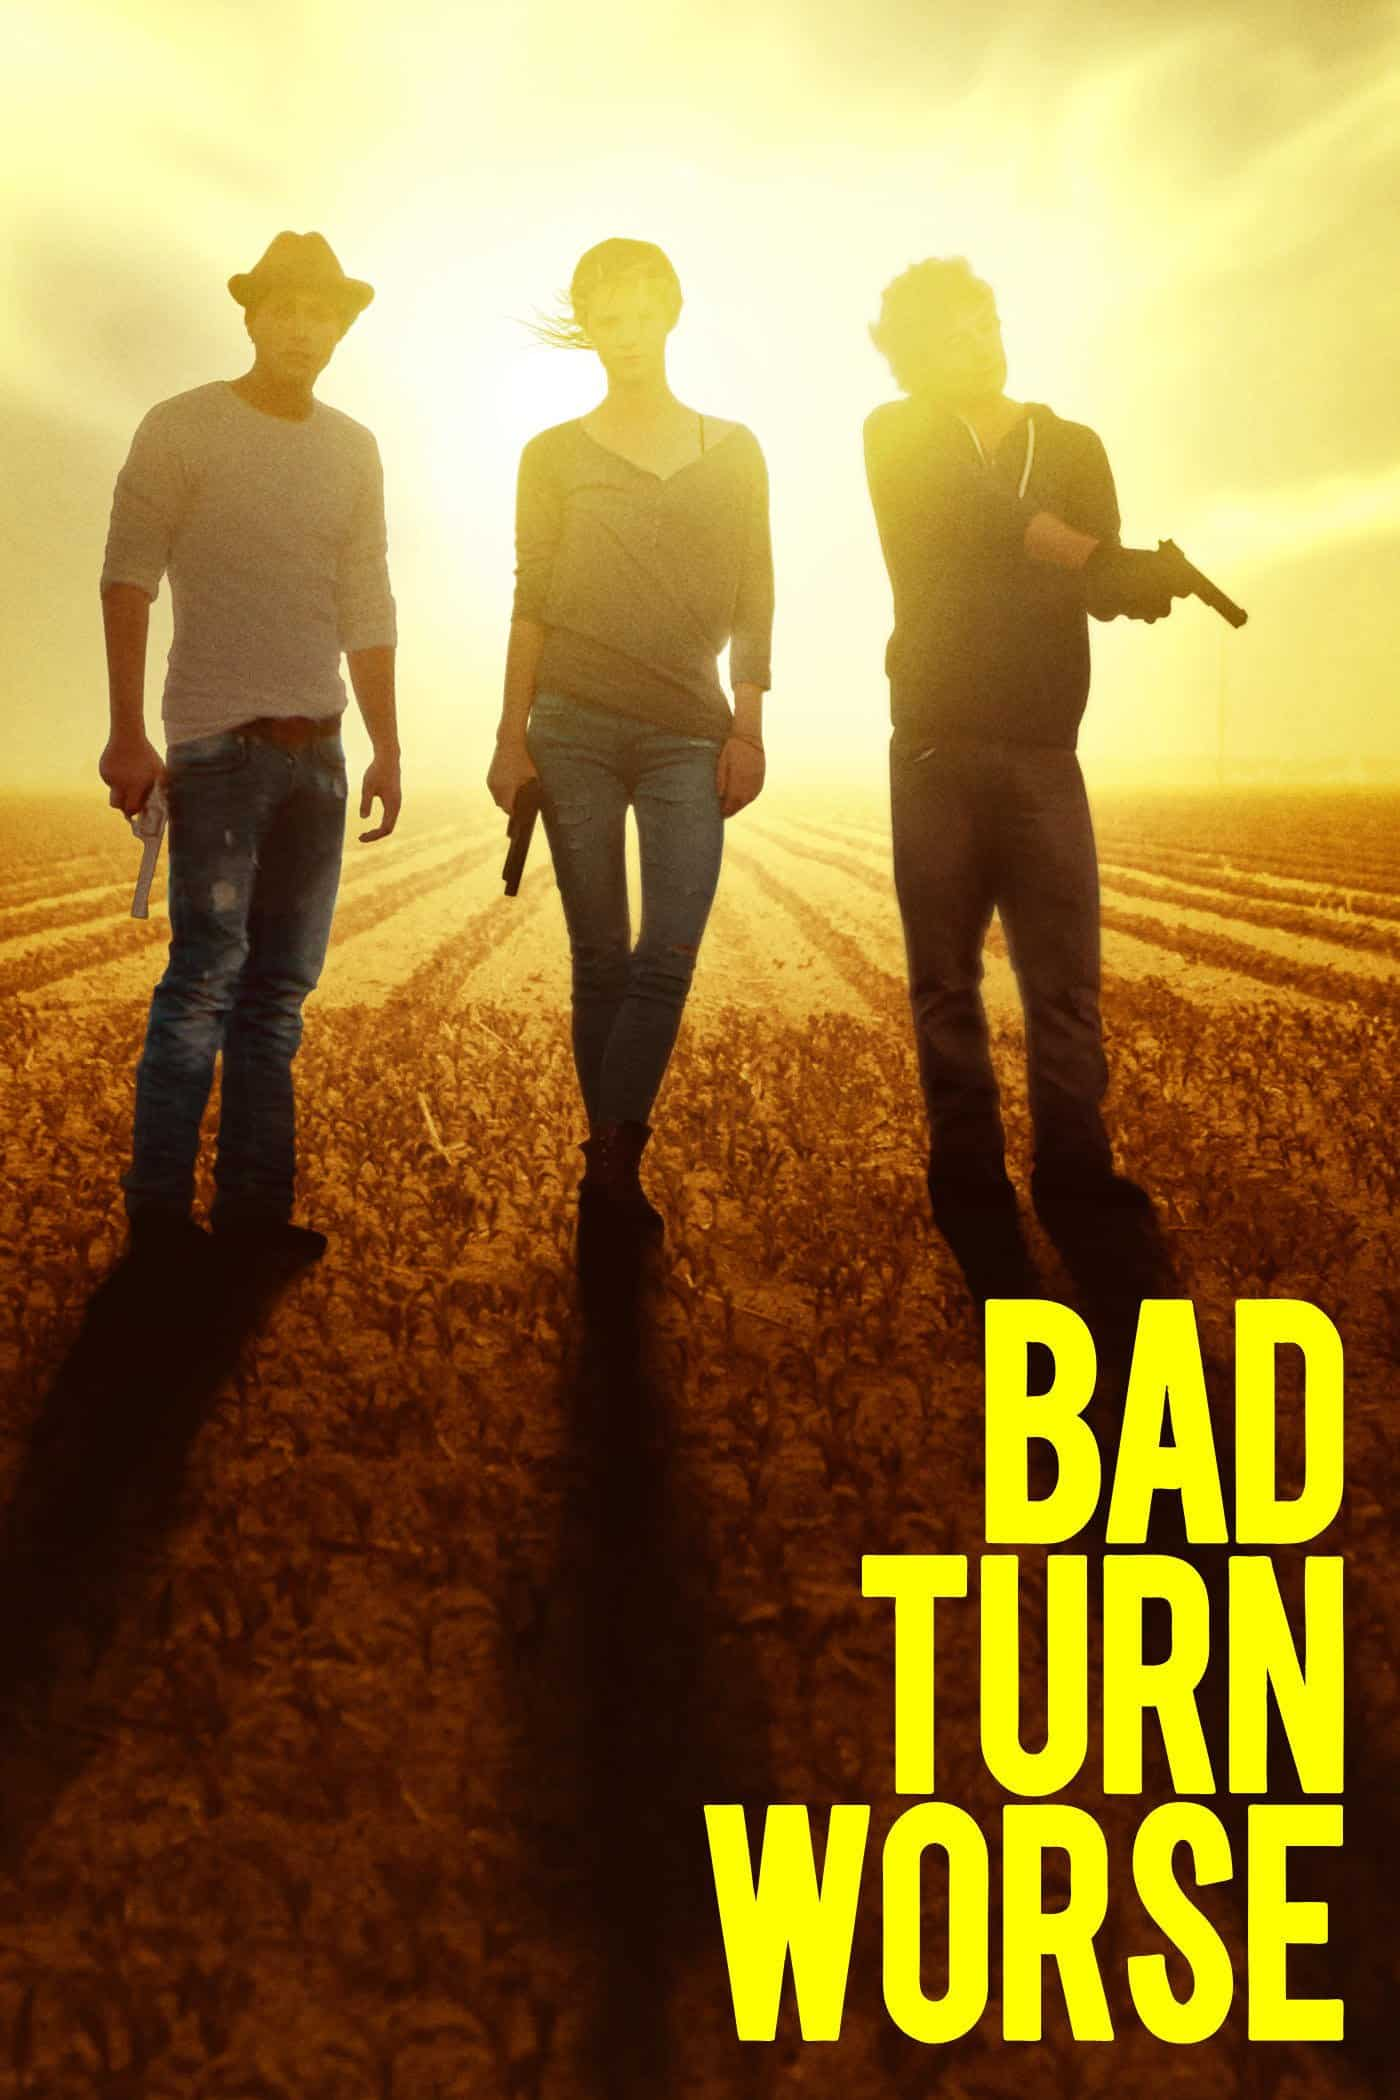 Bad Turn Worse, 2013